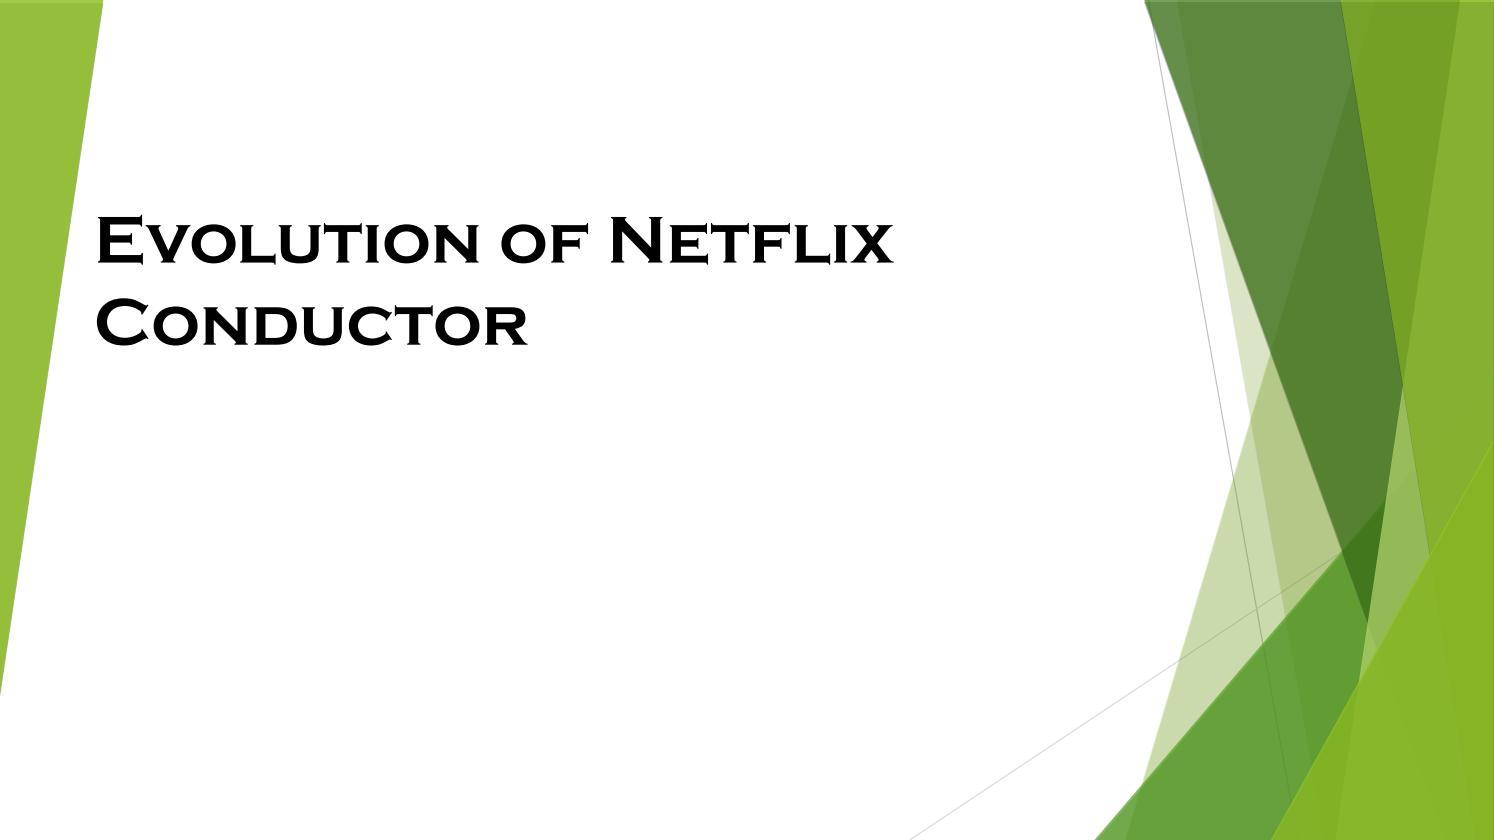 Evolution of Netflix Conductor by kajal agarwal - issuu